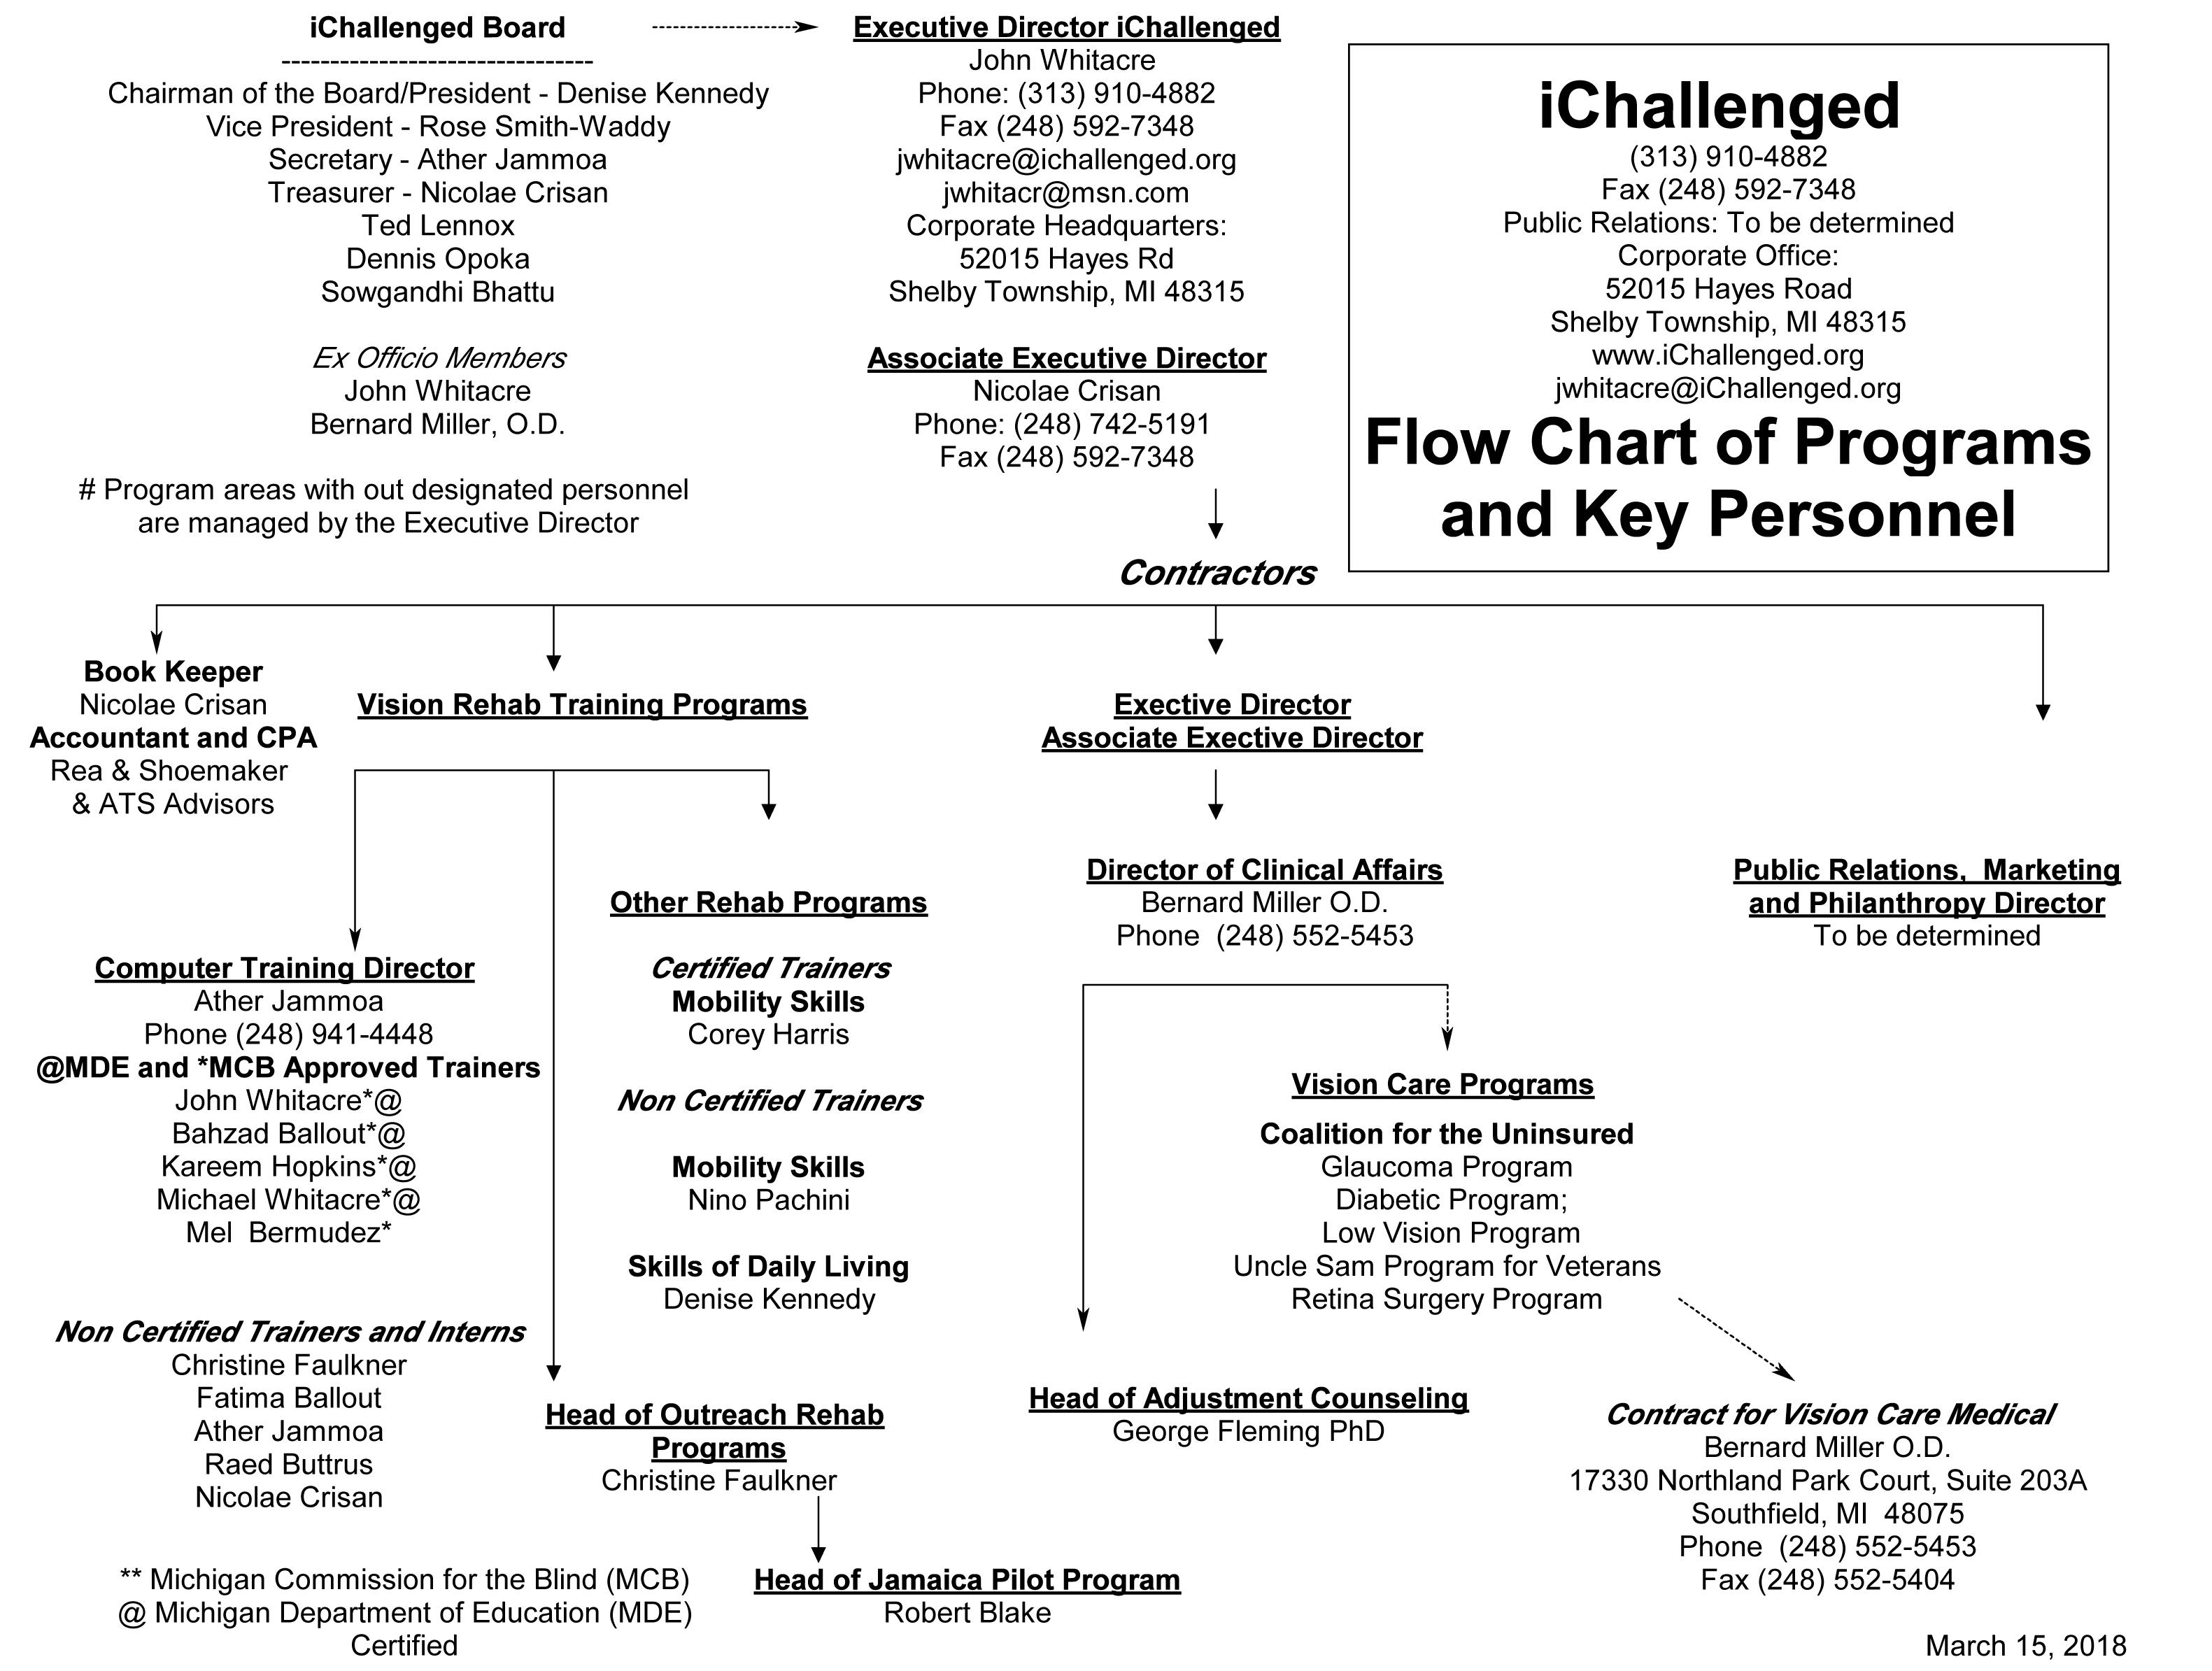 iChallenged Organizational Chart 2017